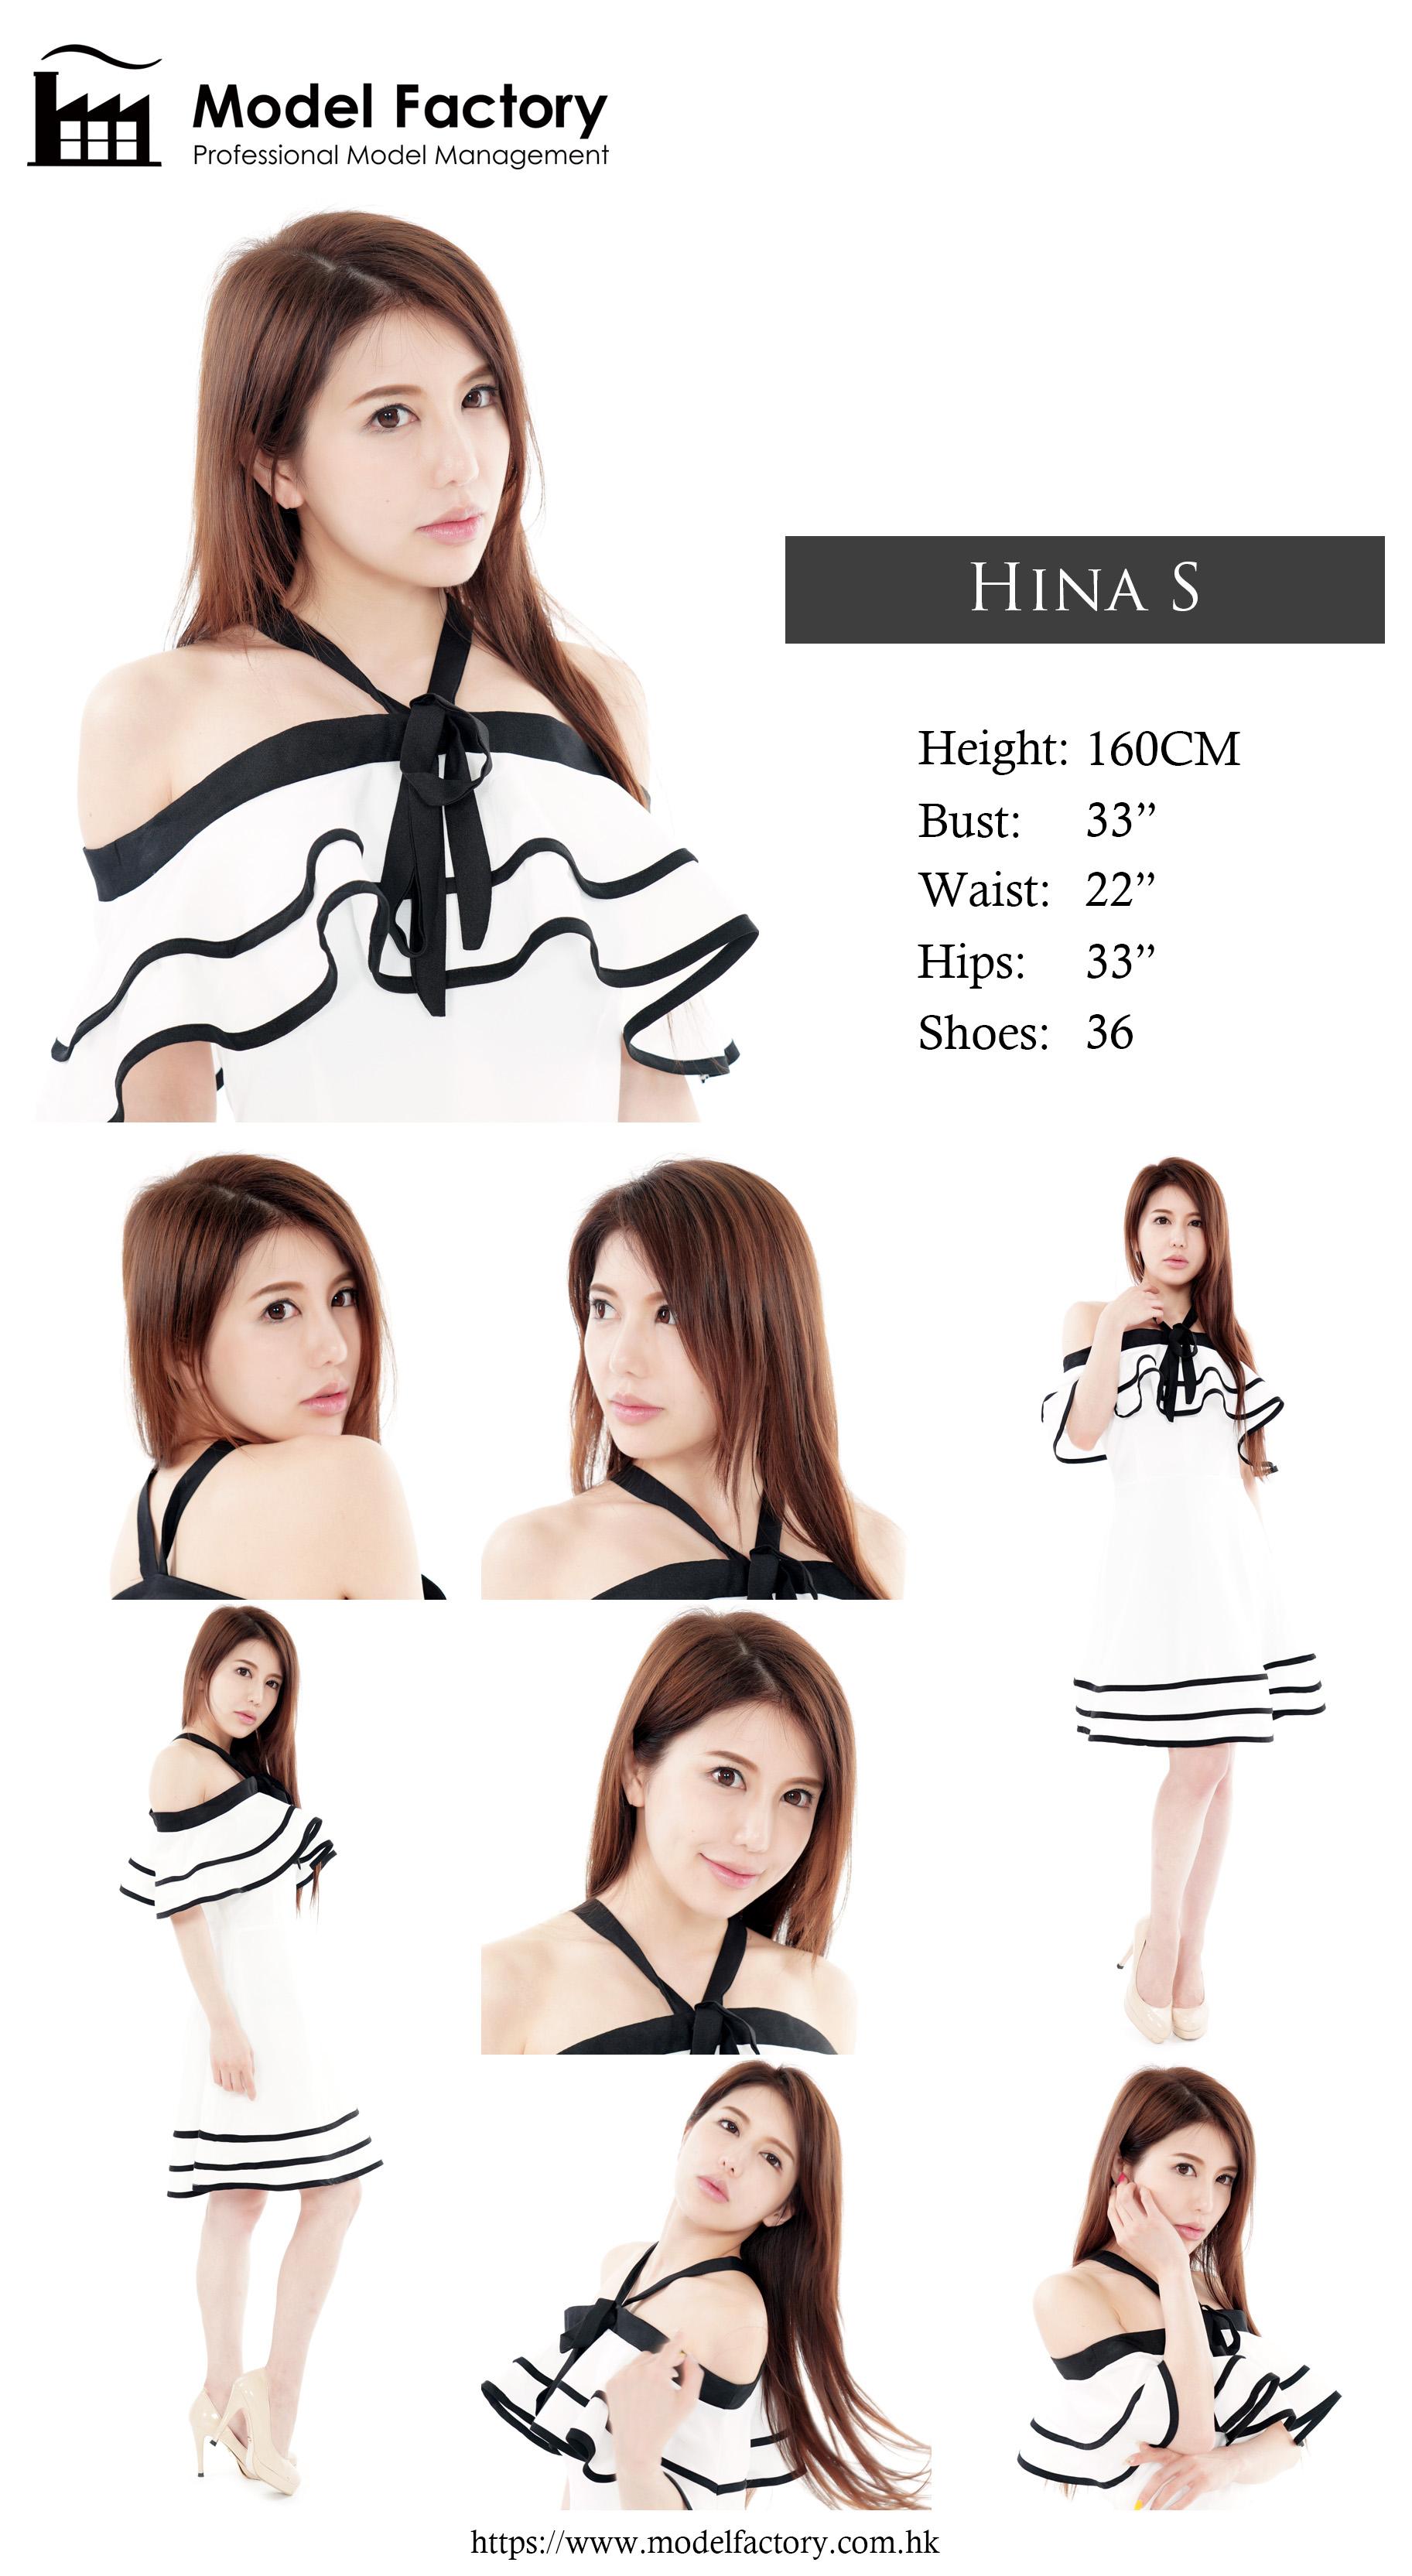 Model Factory Japanese Model HinaS